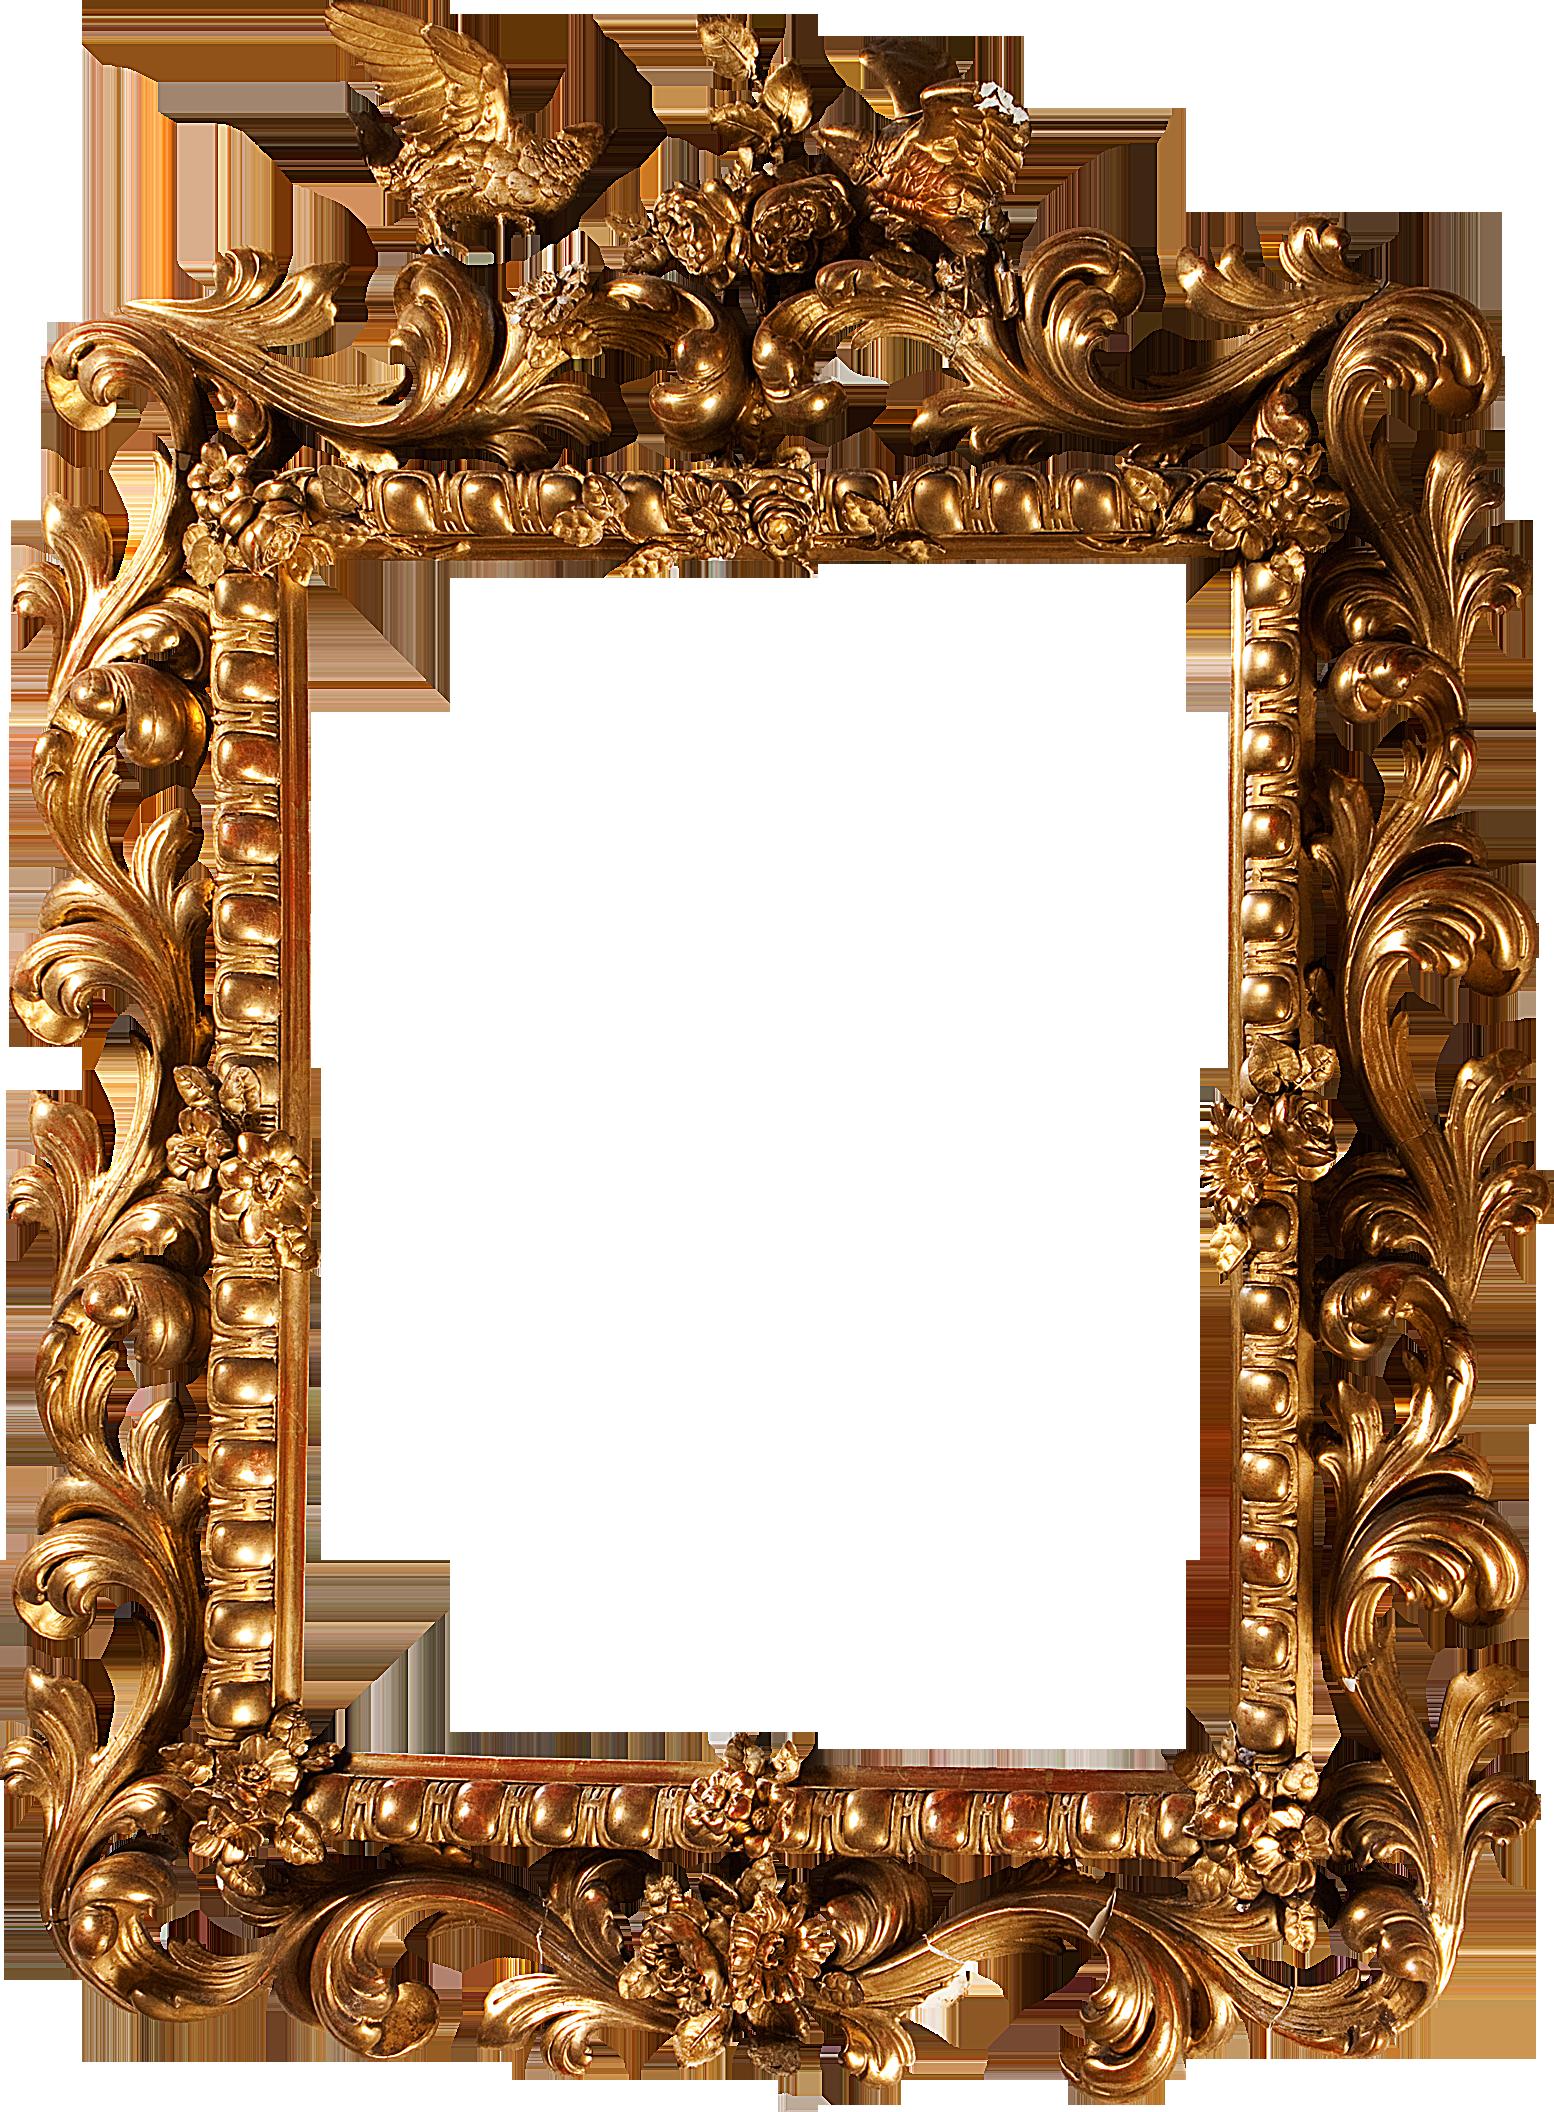 фото и видео рамка